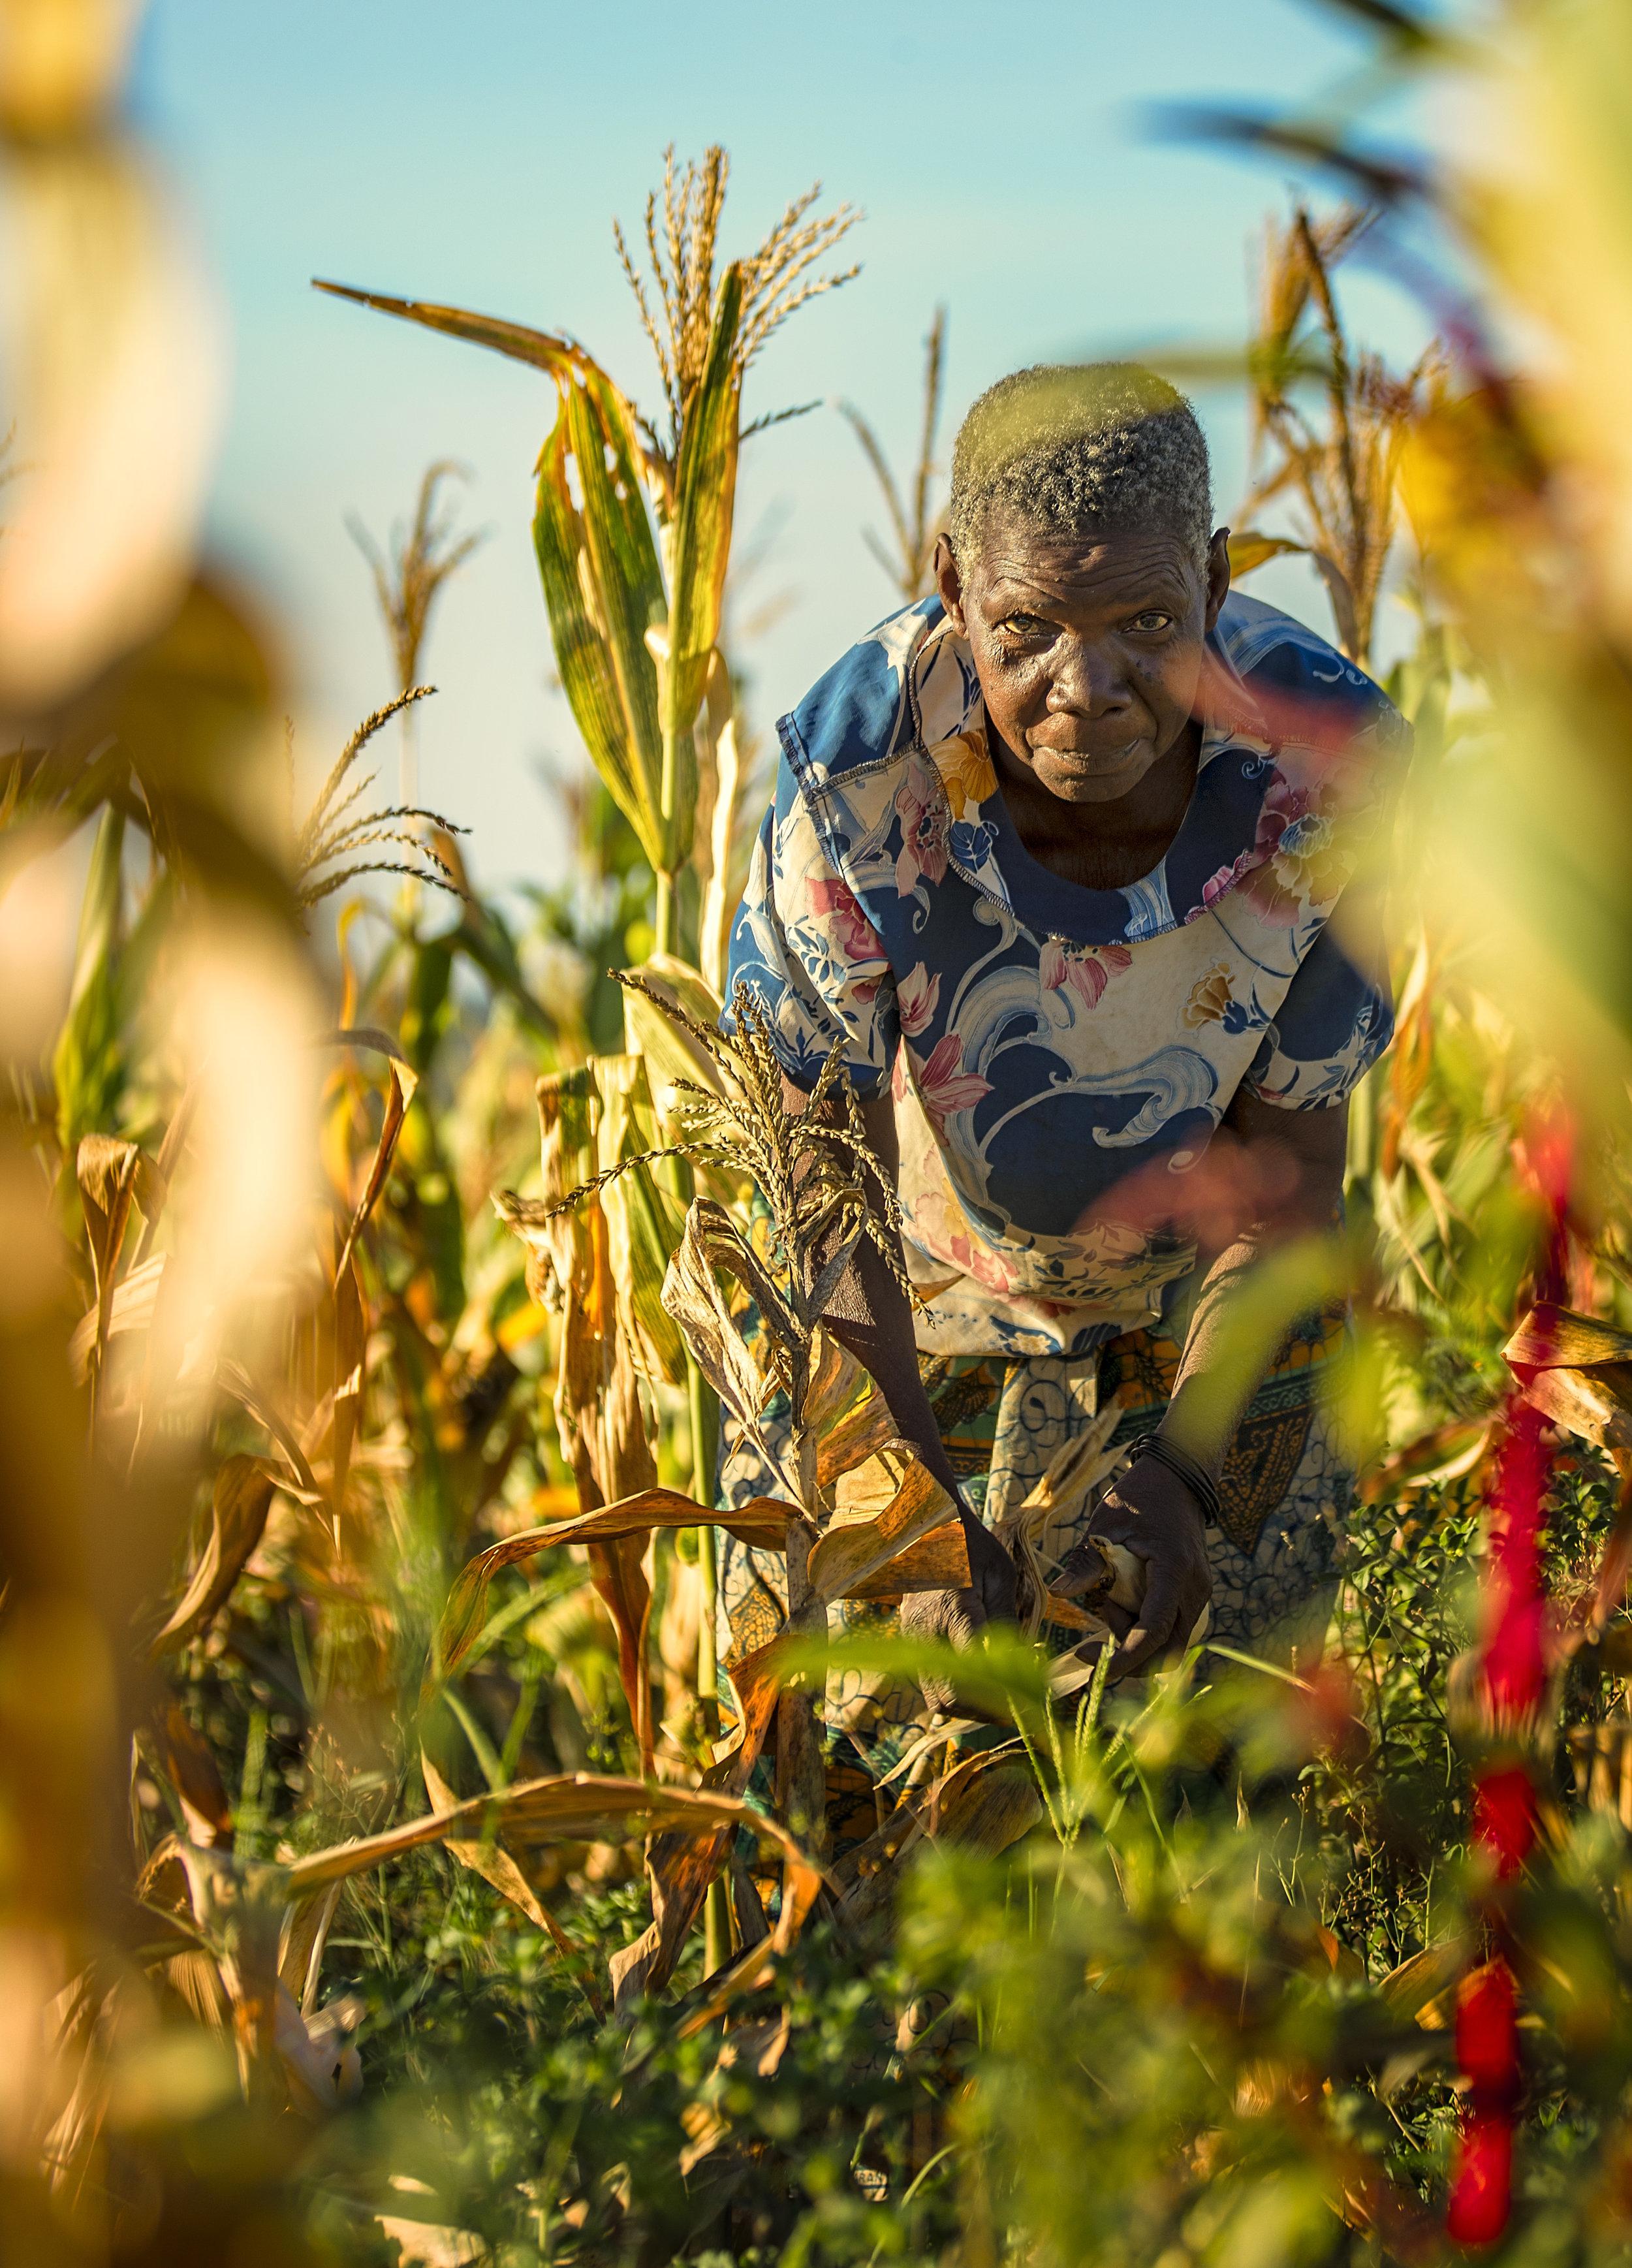 Simon+Needham+Photography+Tanzania+14.jpg